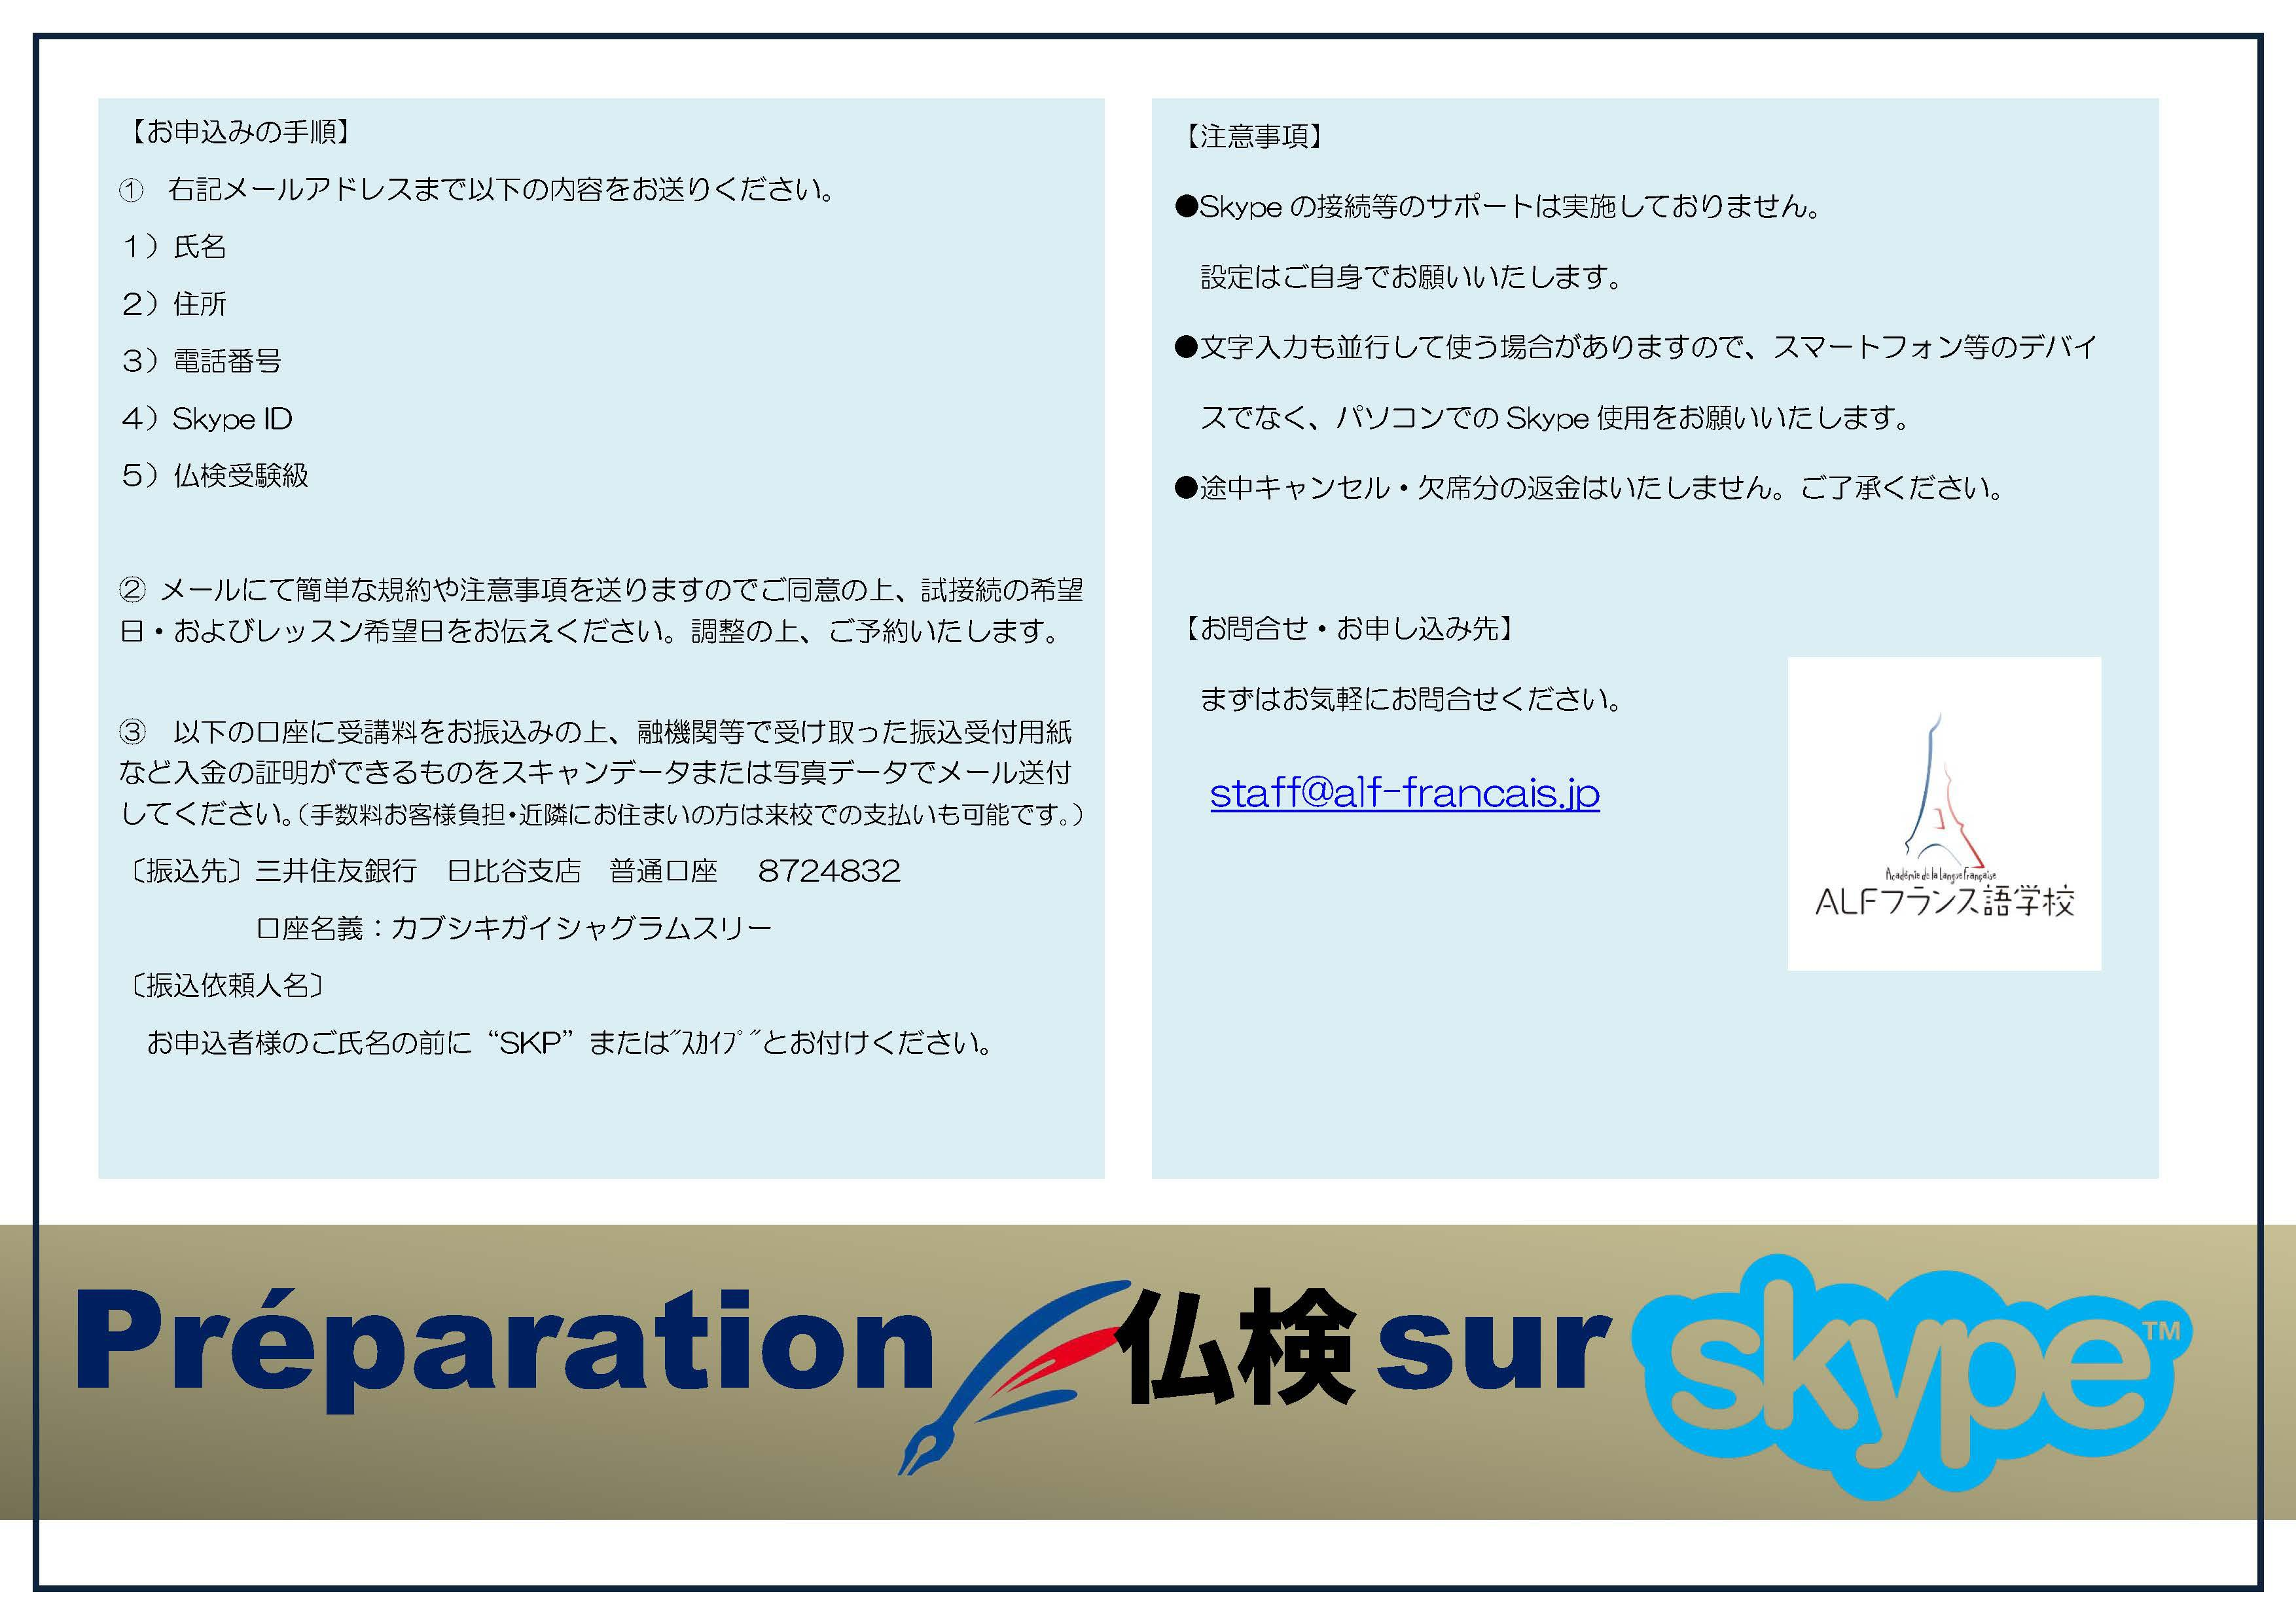 Préparation Futsuken sur Skype_ページ_2.jpg